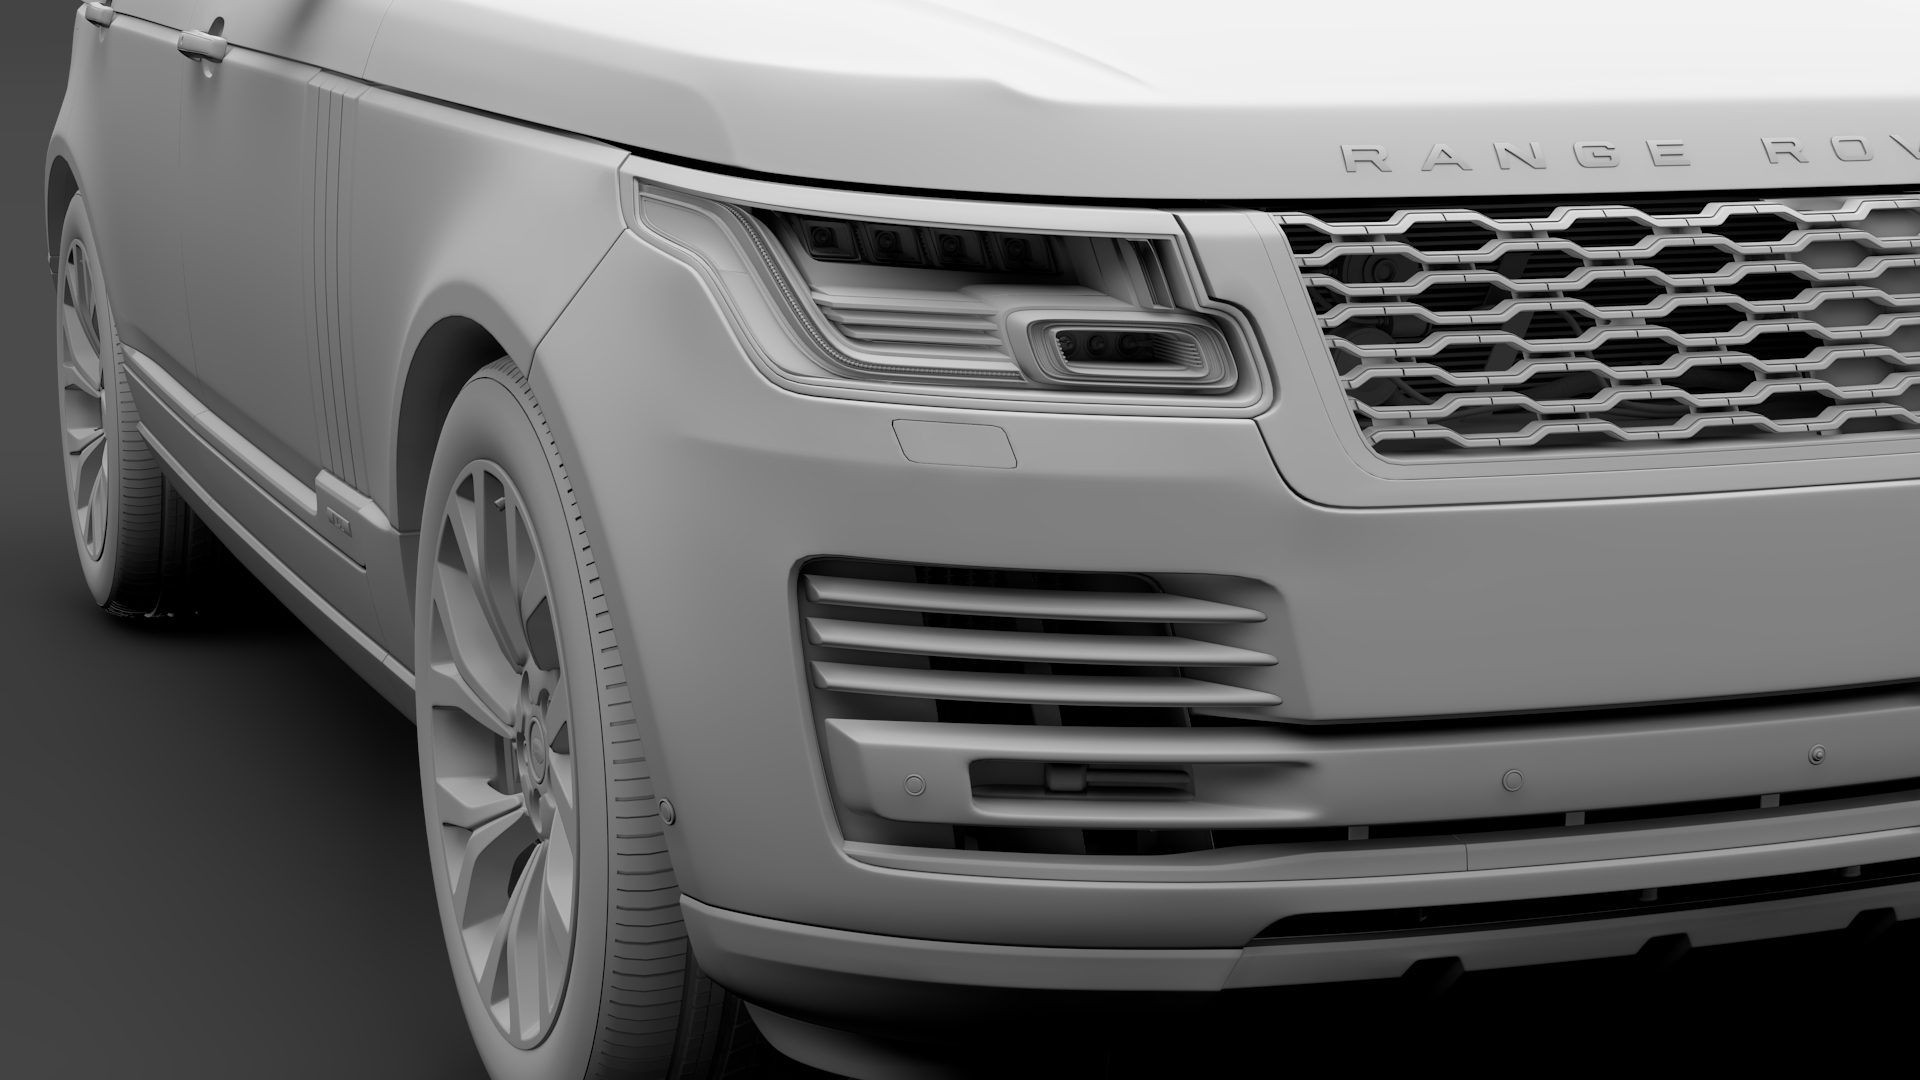 range rover autobiography p400e lwb l405 2018 3d model fbx c4d lwo ma mb hrc xsi obj 277366